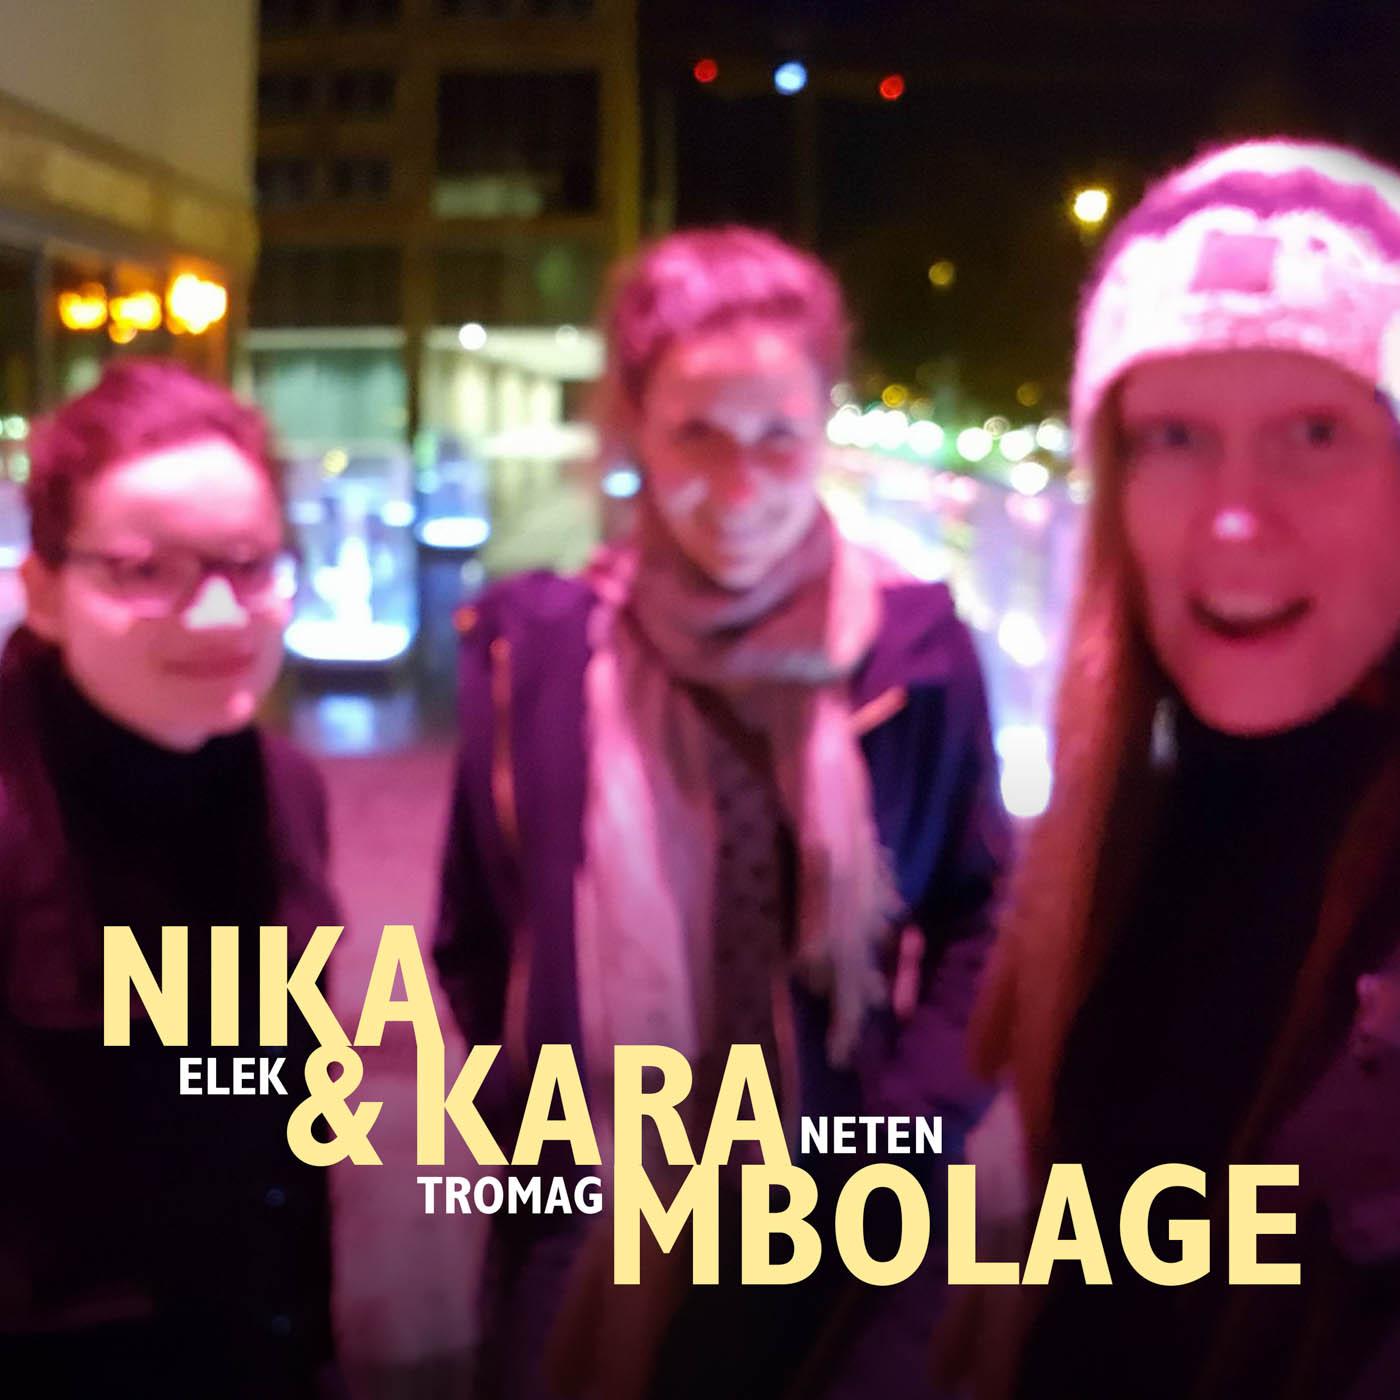 Nika & Karambolage